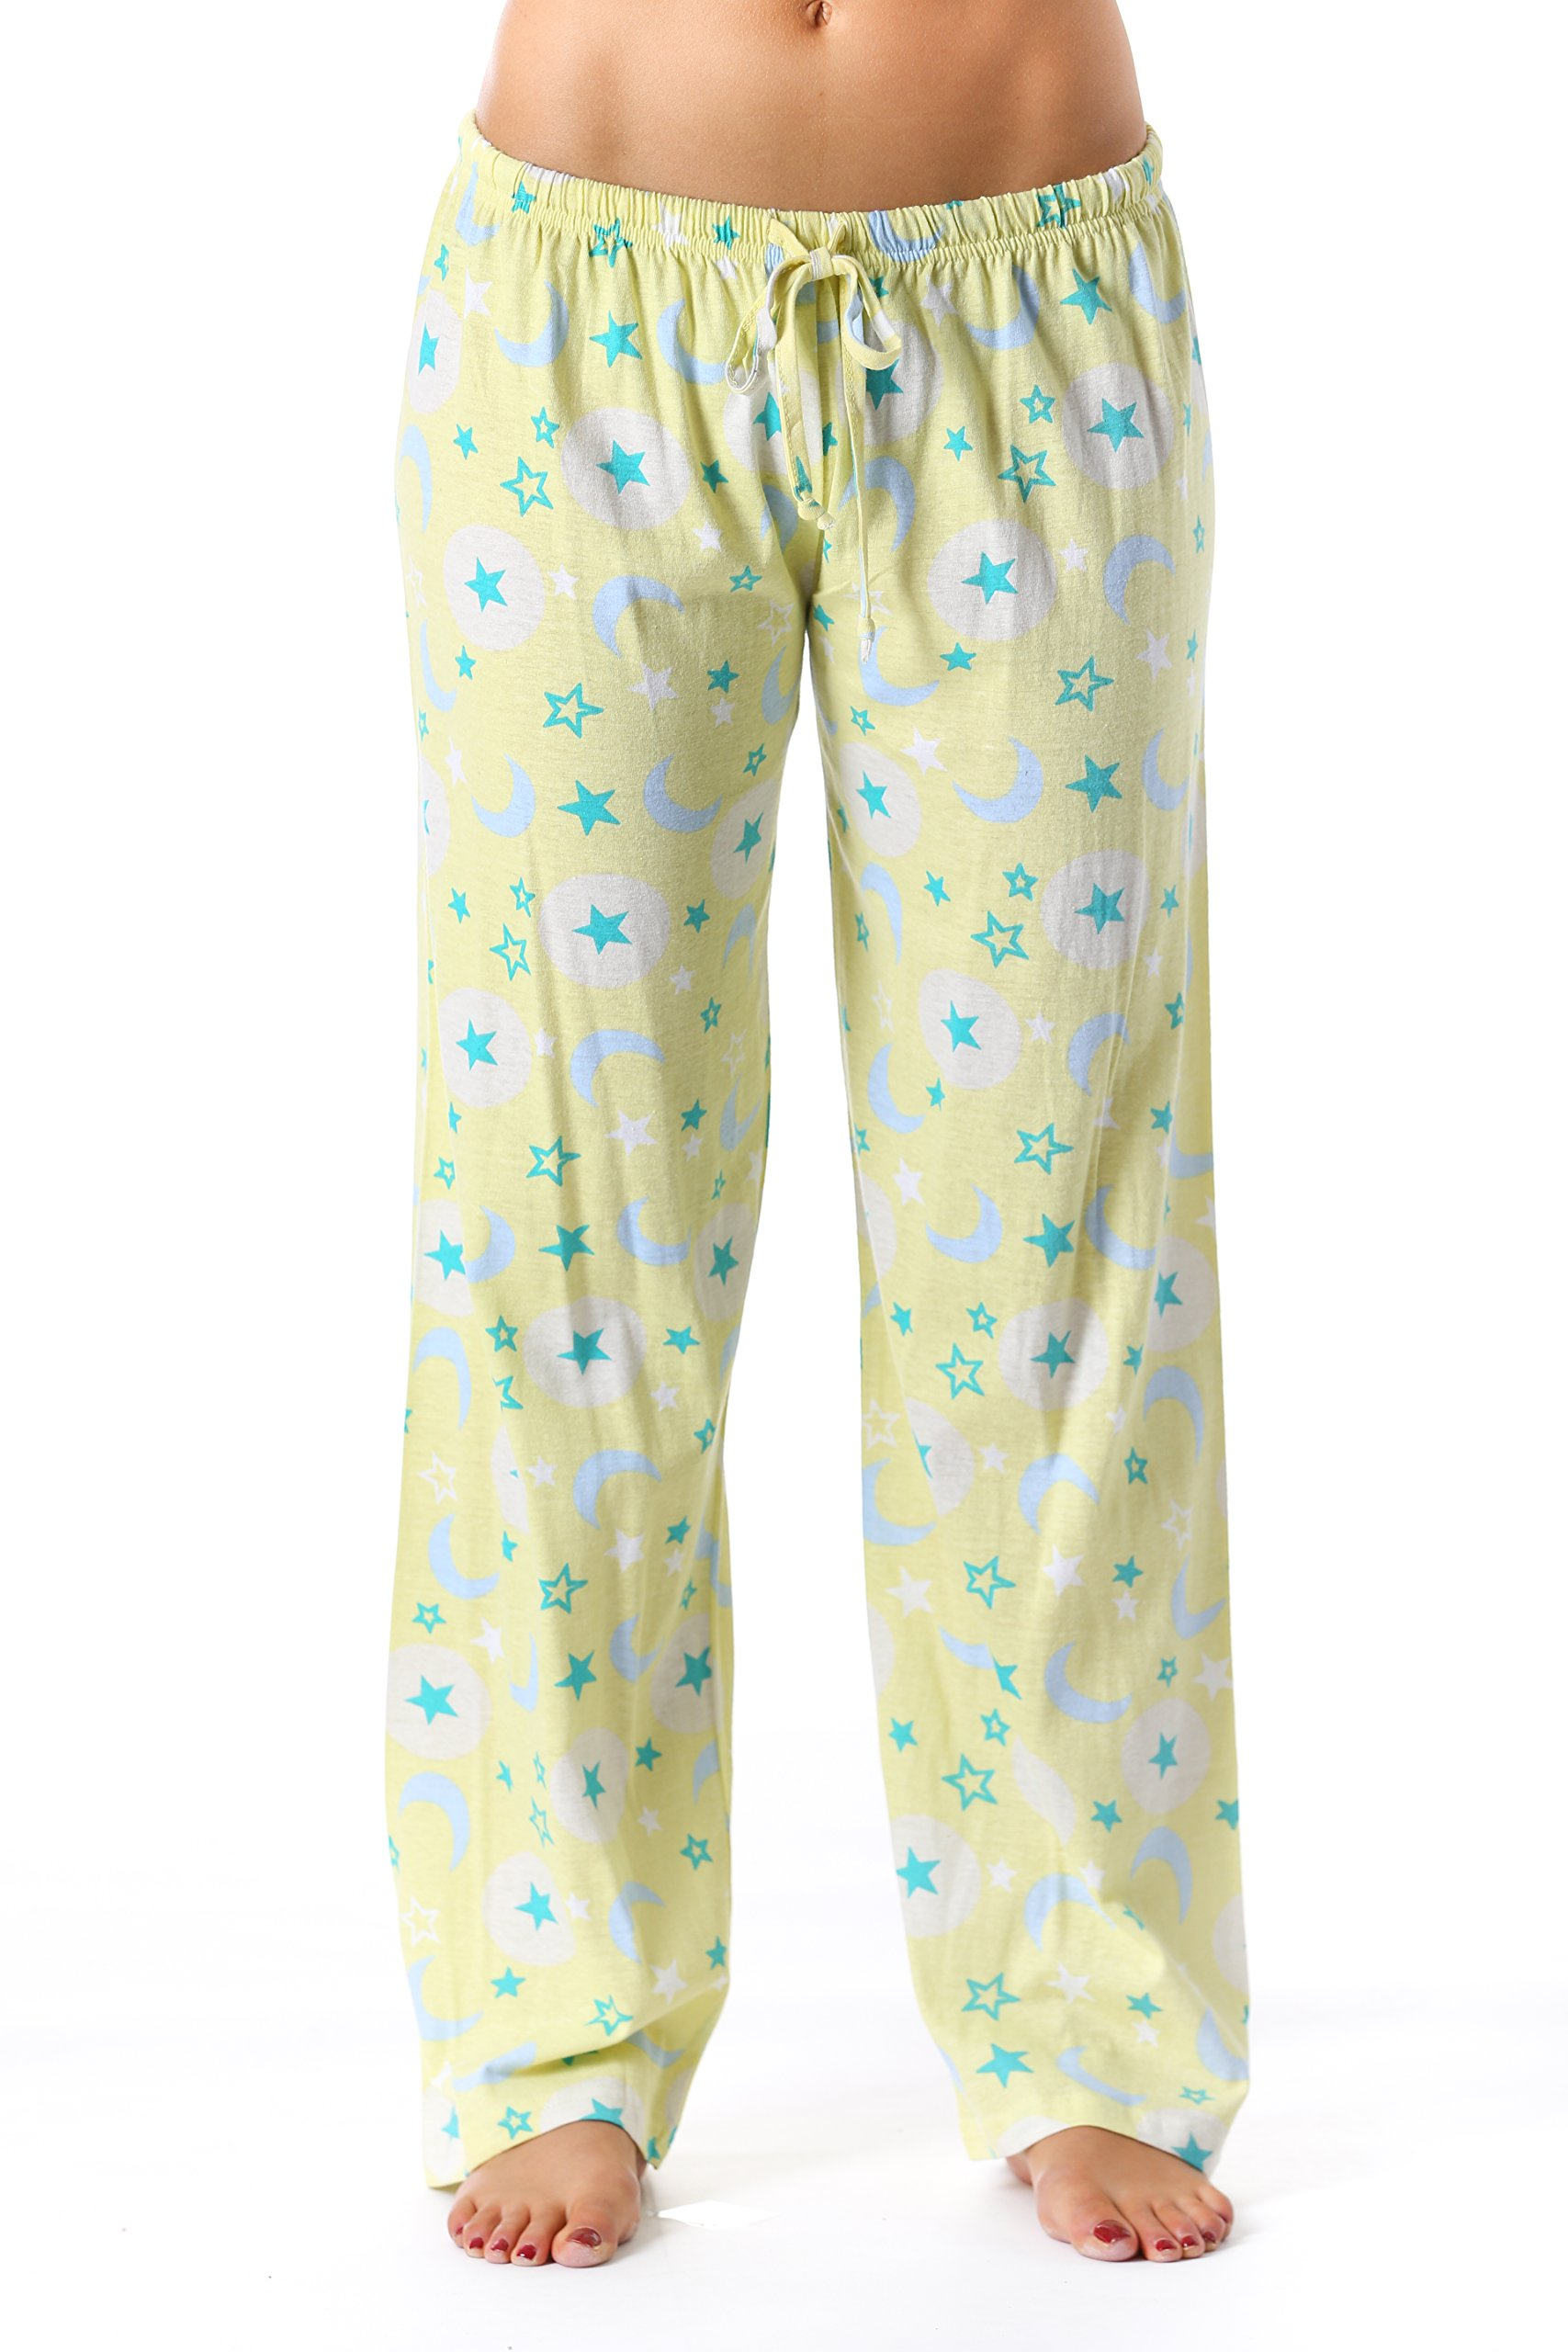 Just Love 6324-10061-S Women Pajama Pants/Sleepwear, Celestial Glow, Small by Just Love (Image #1)